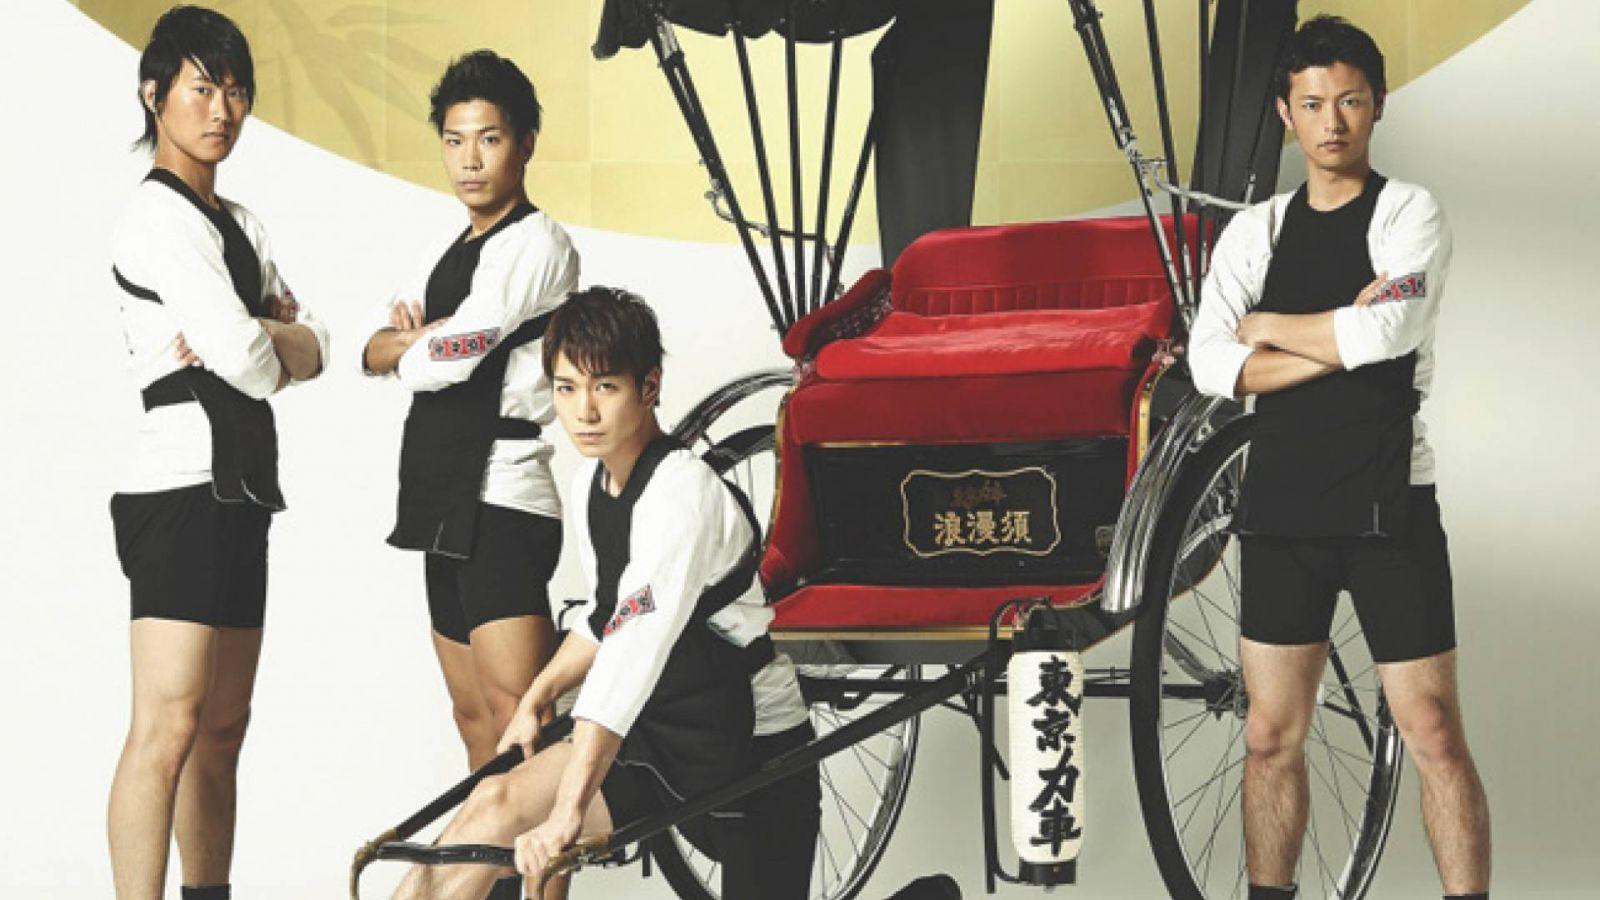 Tokyo-rickshaw © Tokyo-rickshaw. All rights reserved.